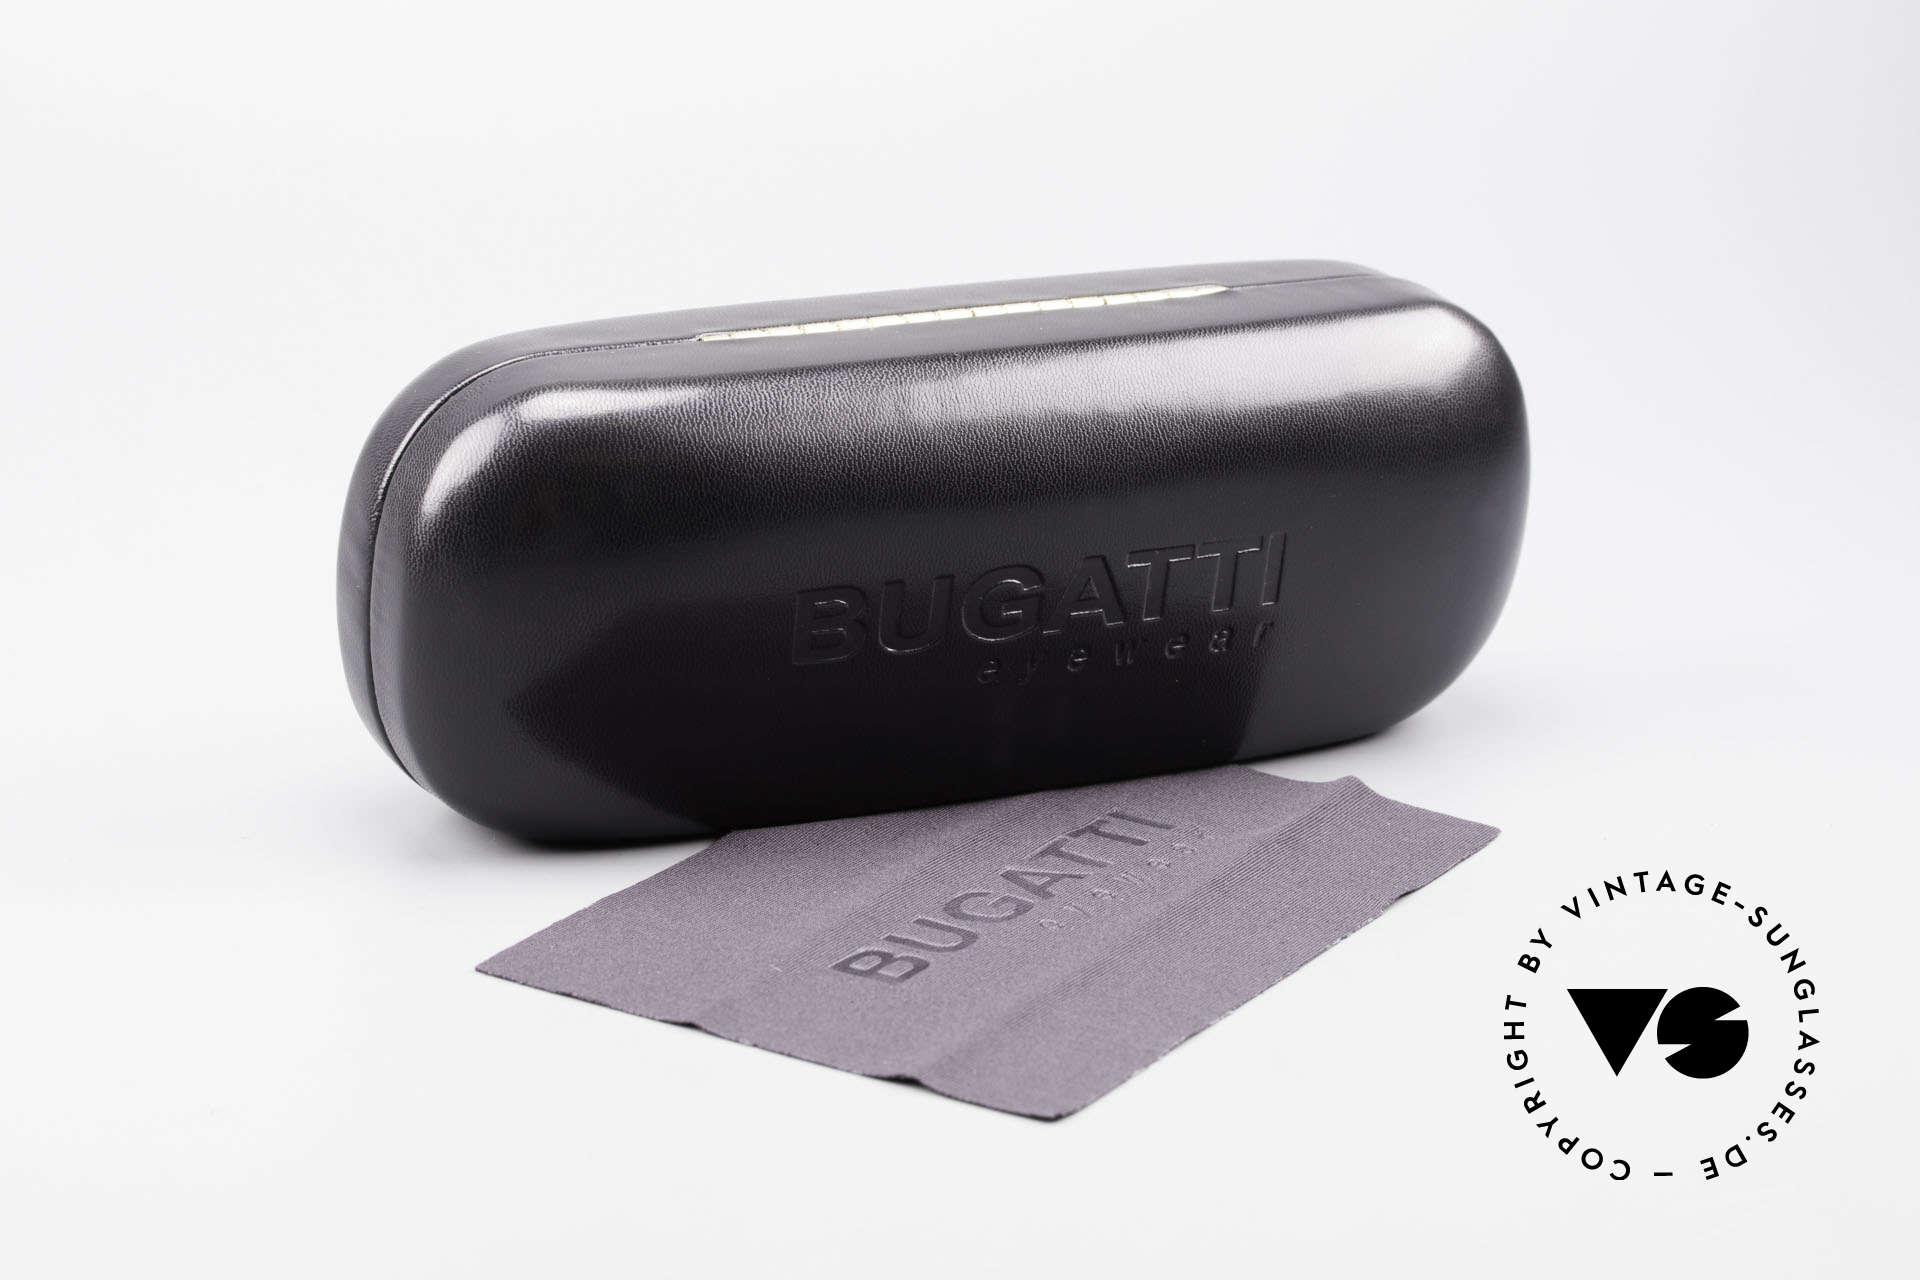 Bugatti 532 Striking Luxury Glasses Men, Size: medium, Made for Men